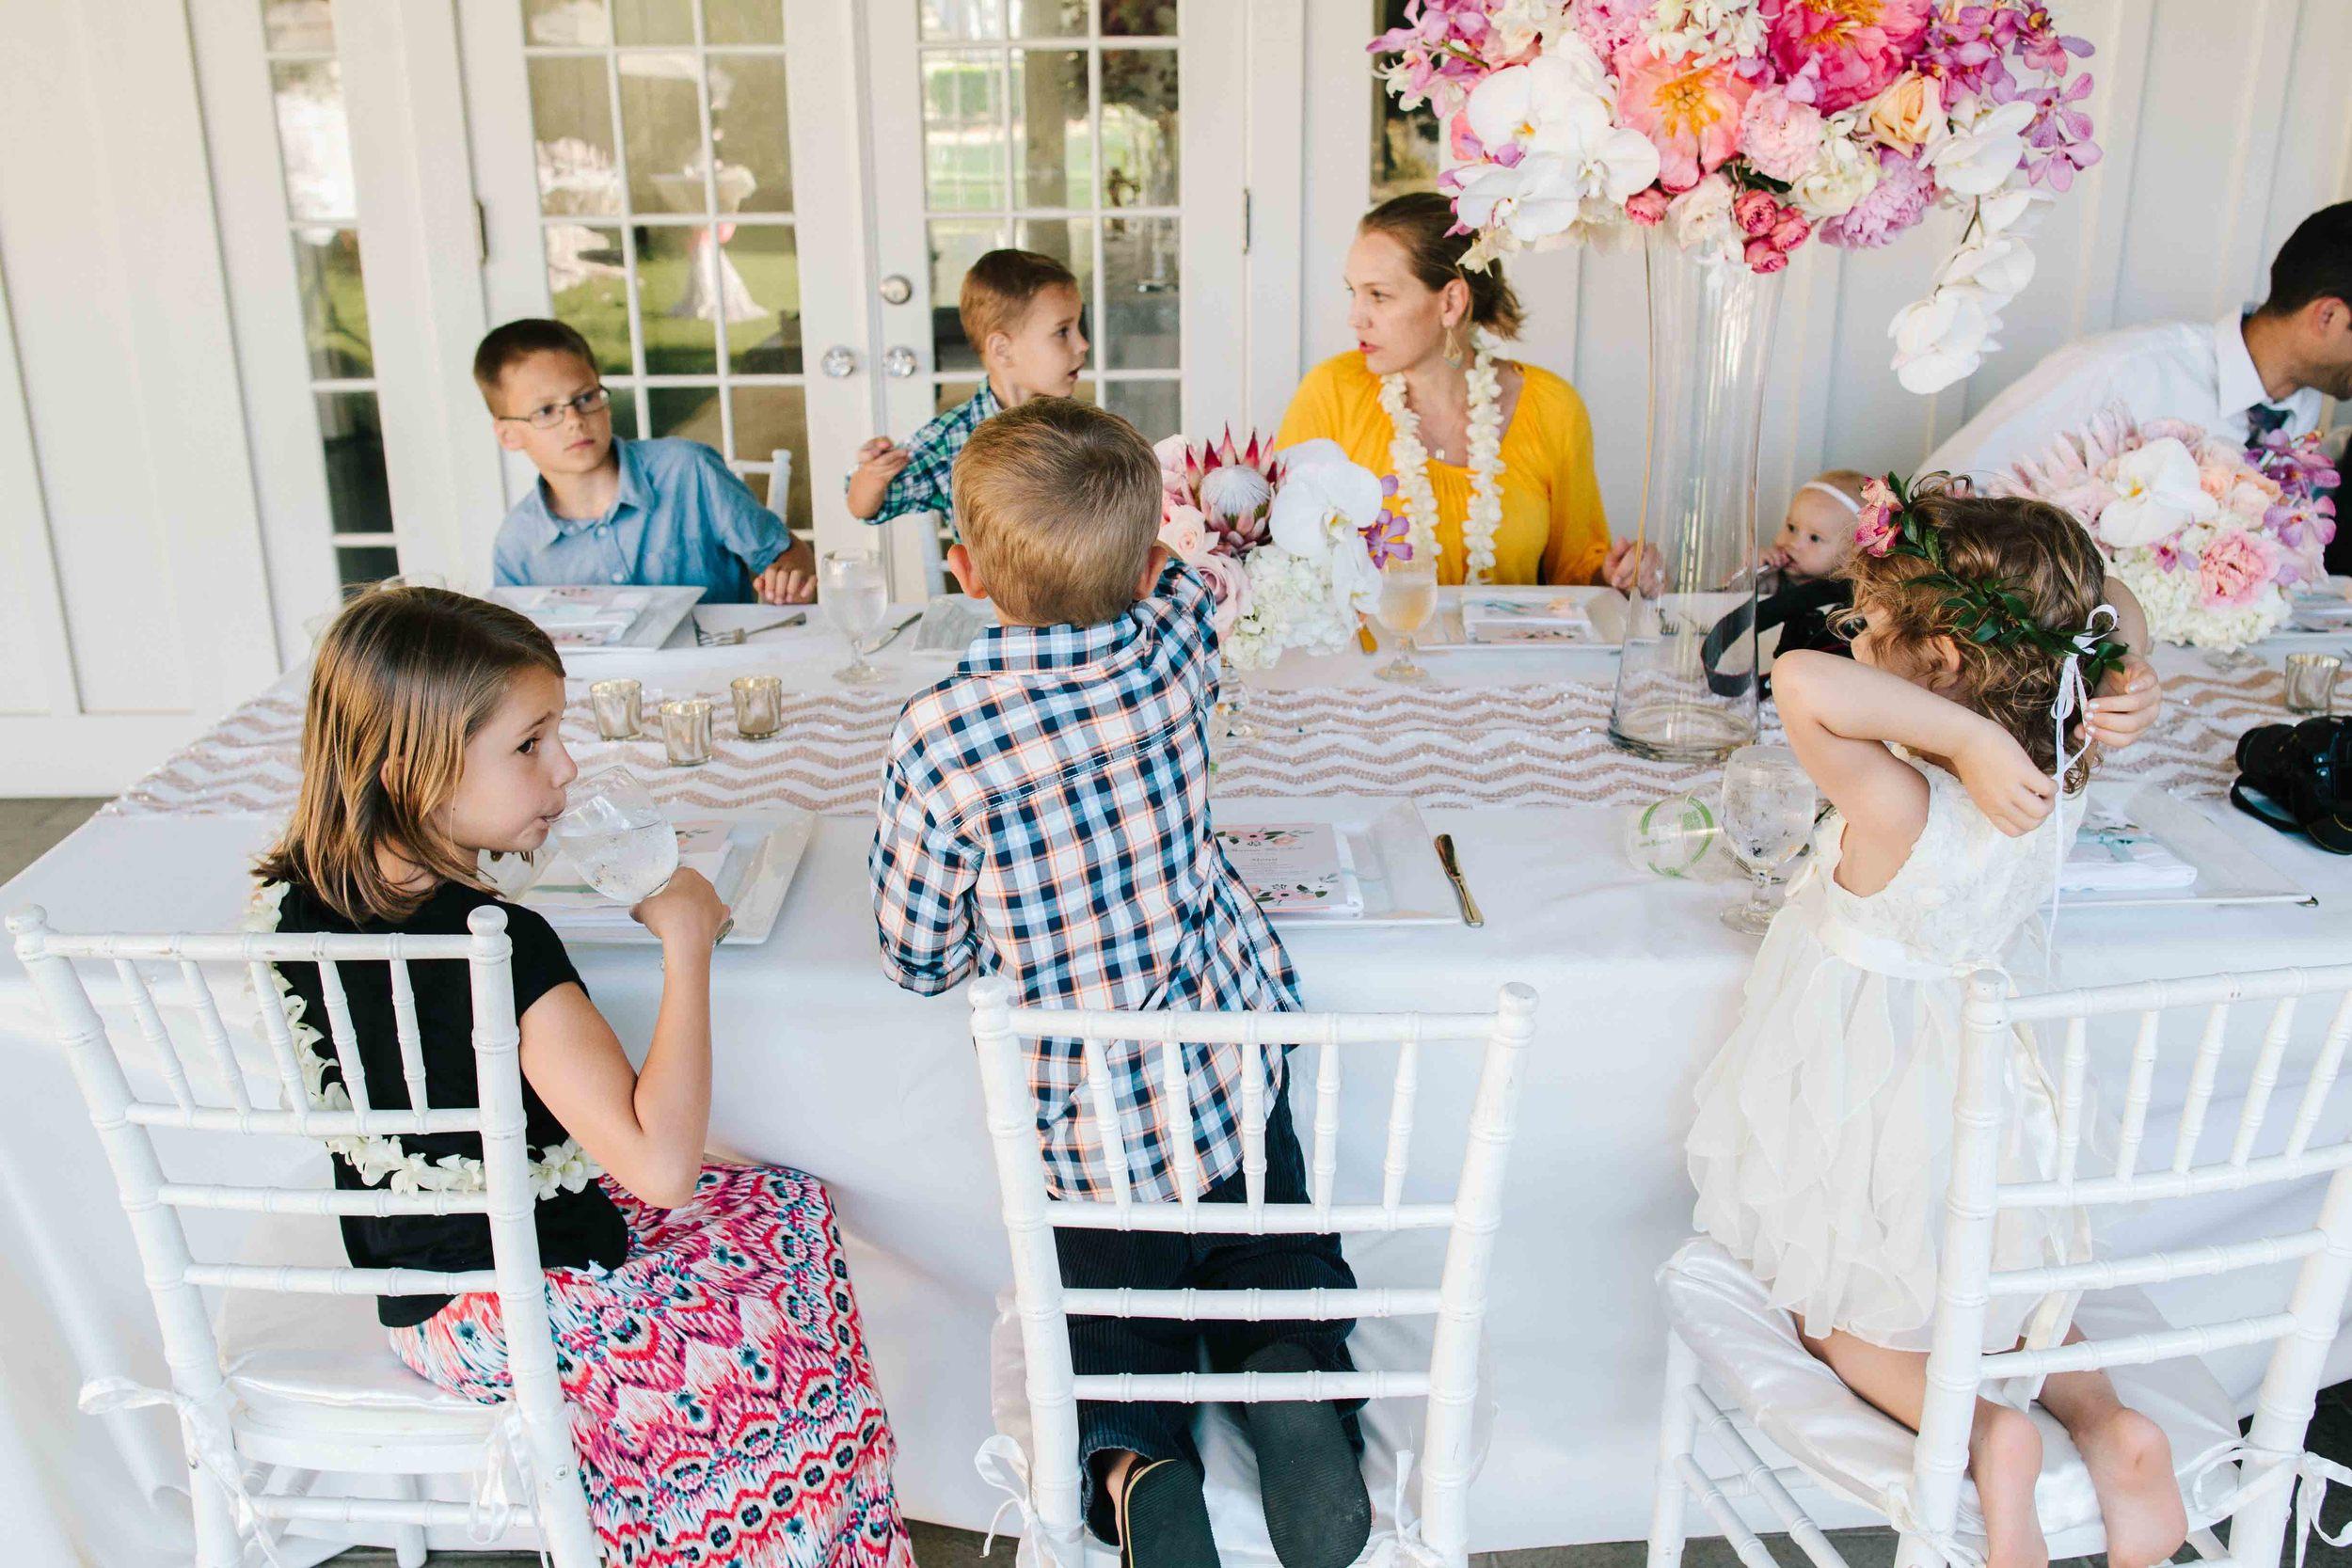 Candid Wedding Photography of Children